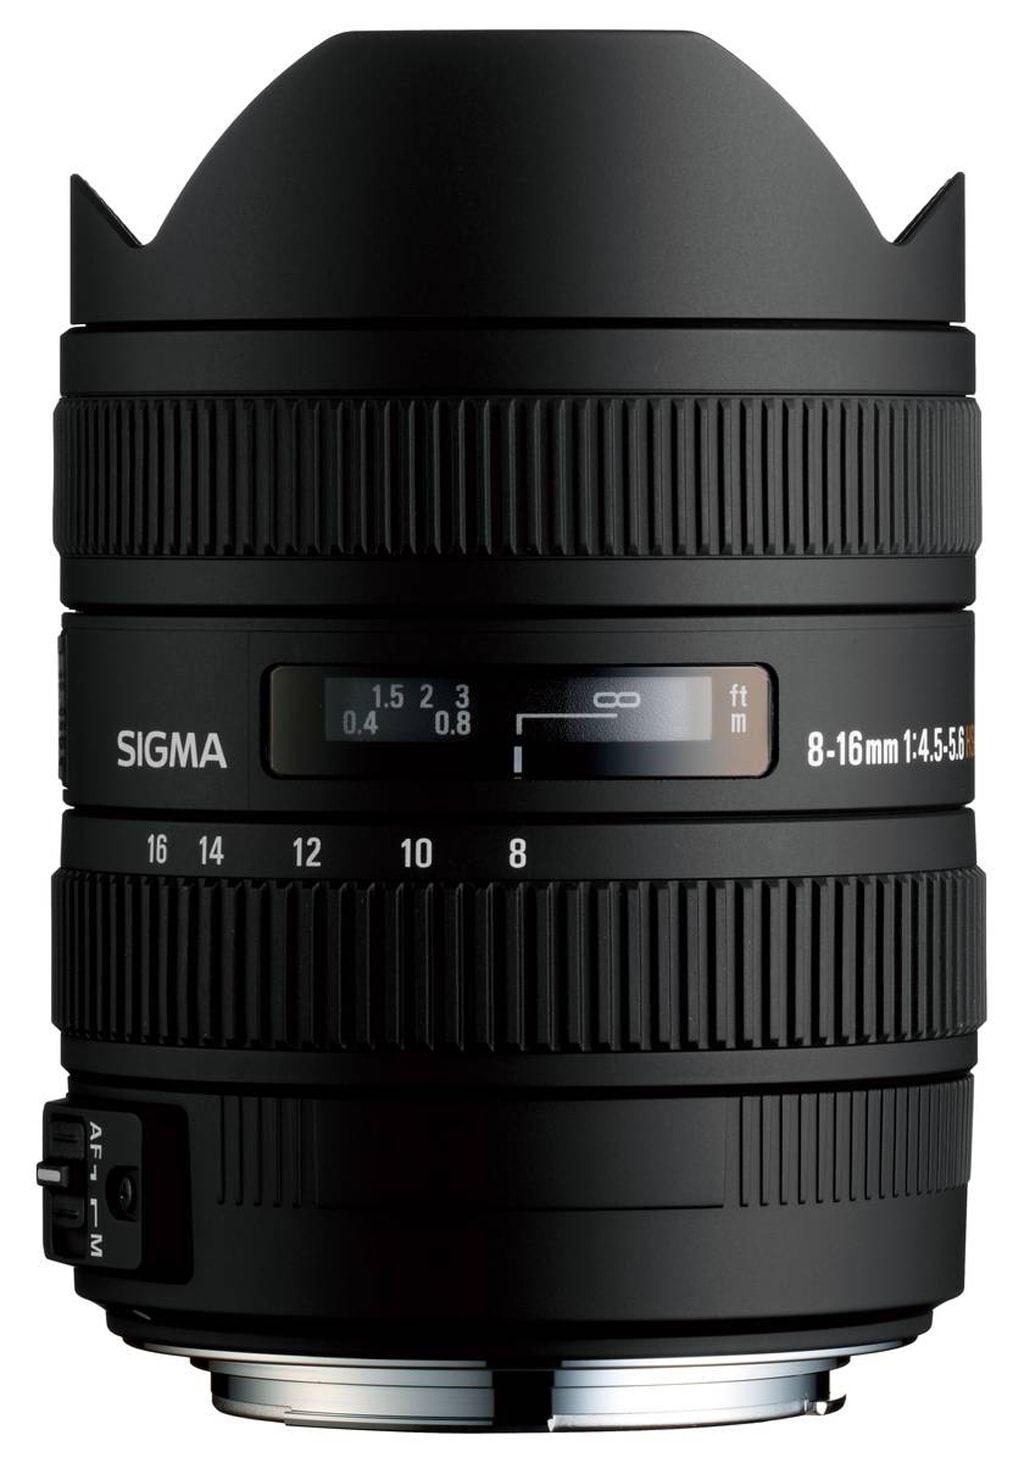 Sigma 8-16 mm 1:4,5-5,6 DC HSM for Nikon